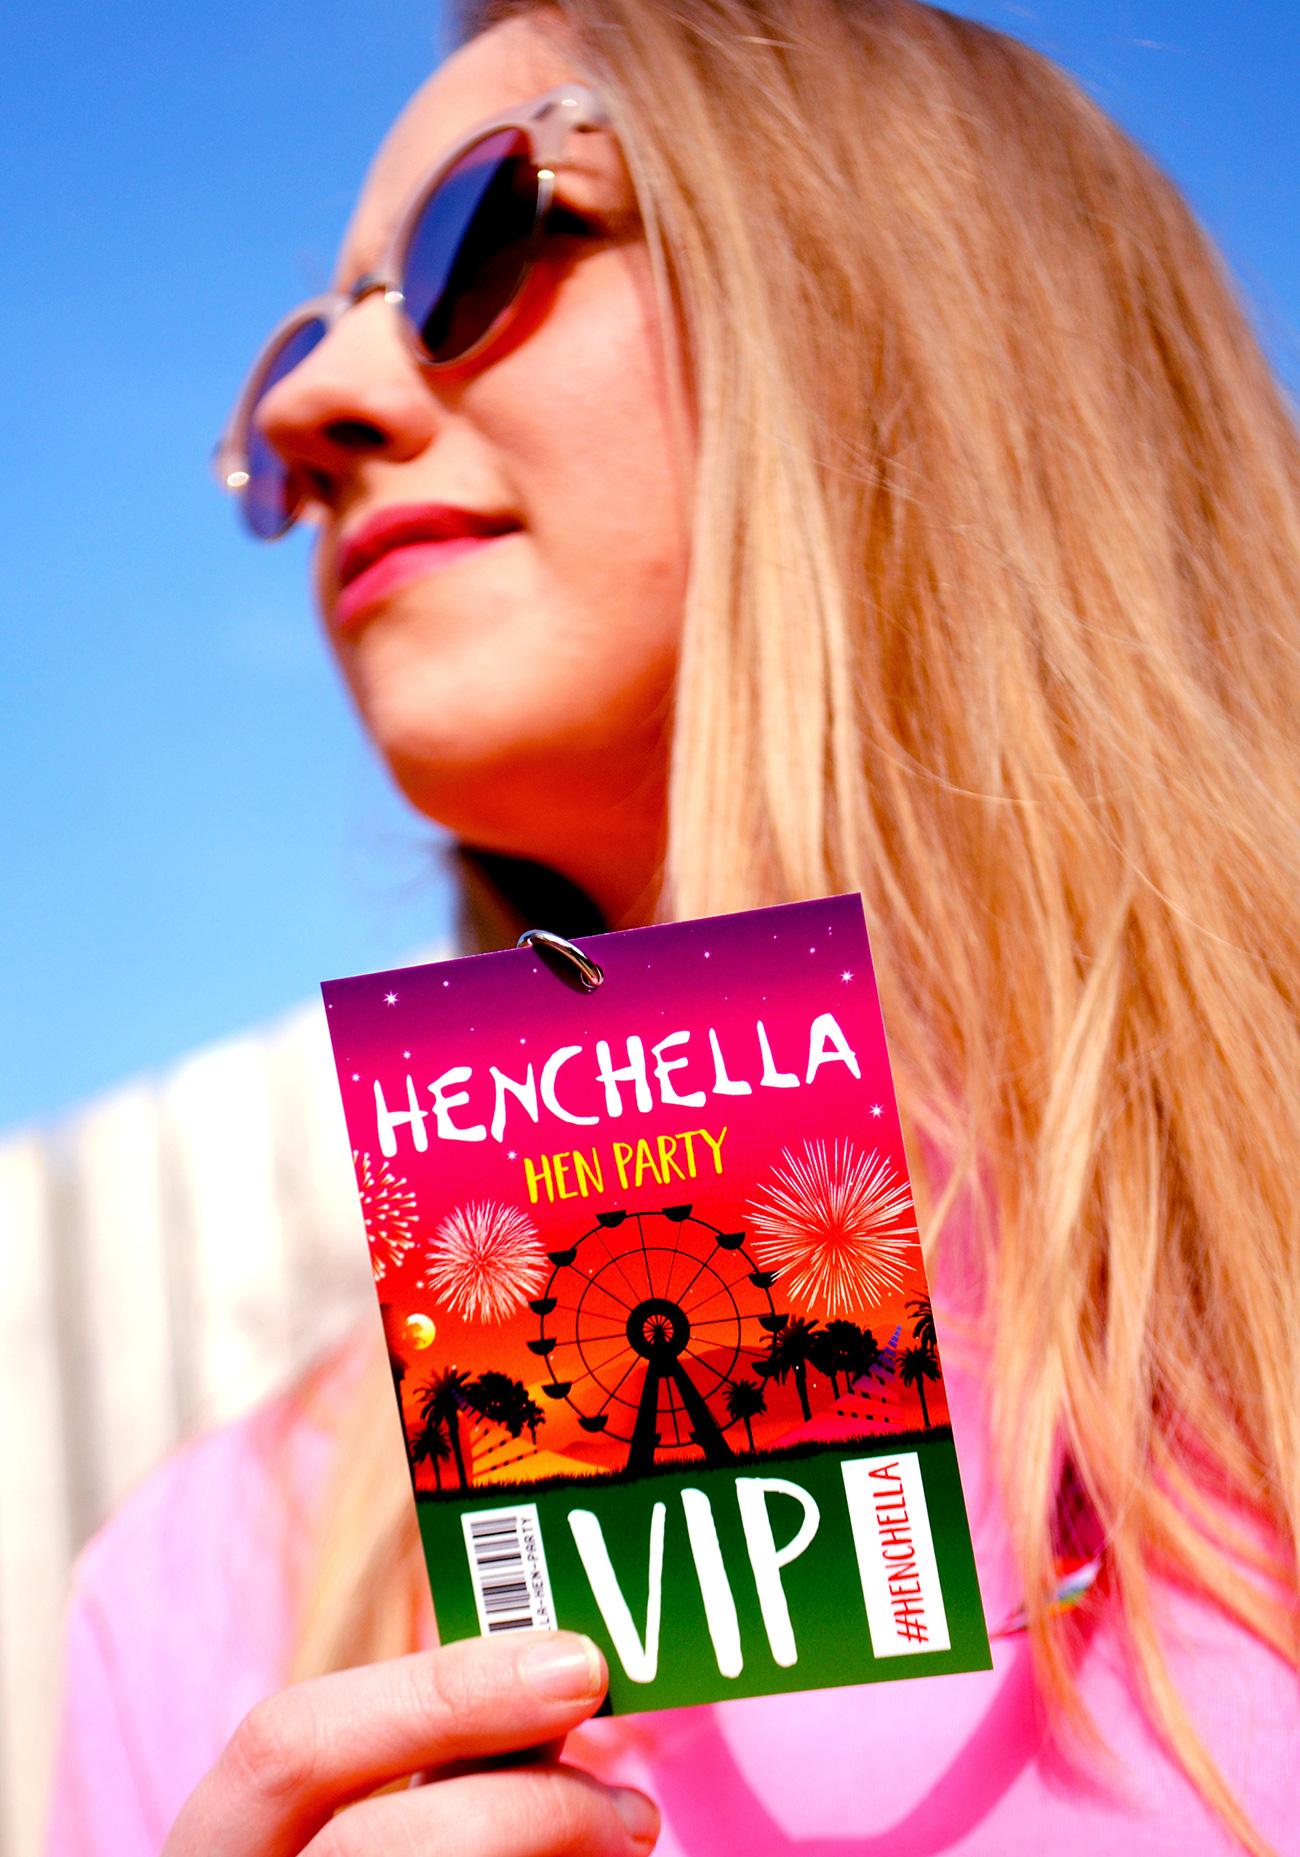 henchella festival hen do party